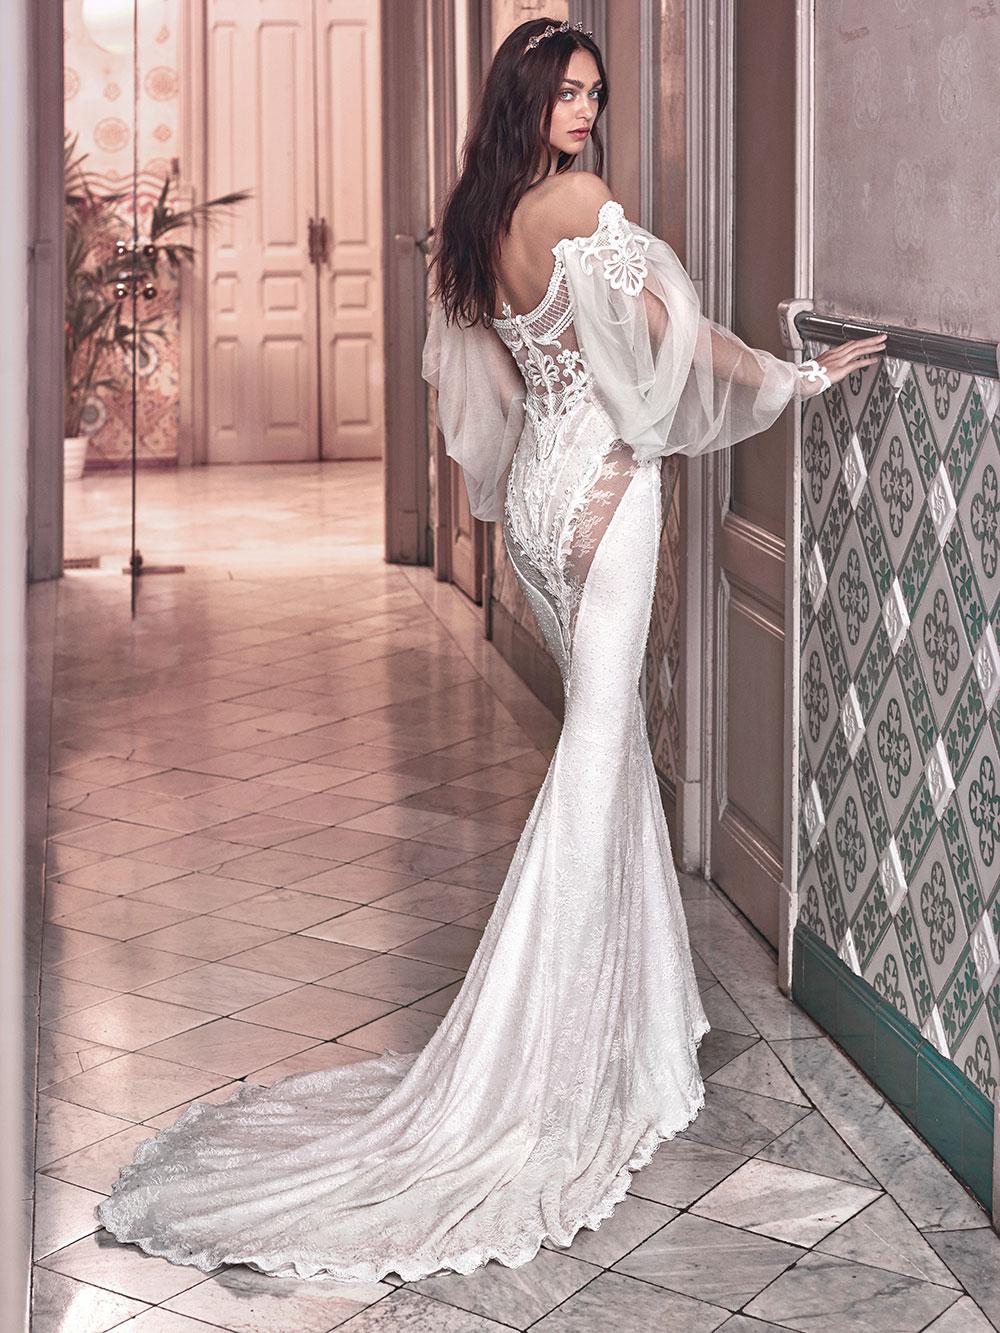 Thelma - Galia Lahav Spring 2018 Collection. www.theweddingnotebook.com